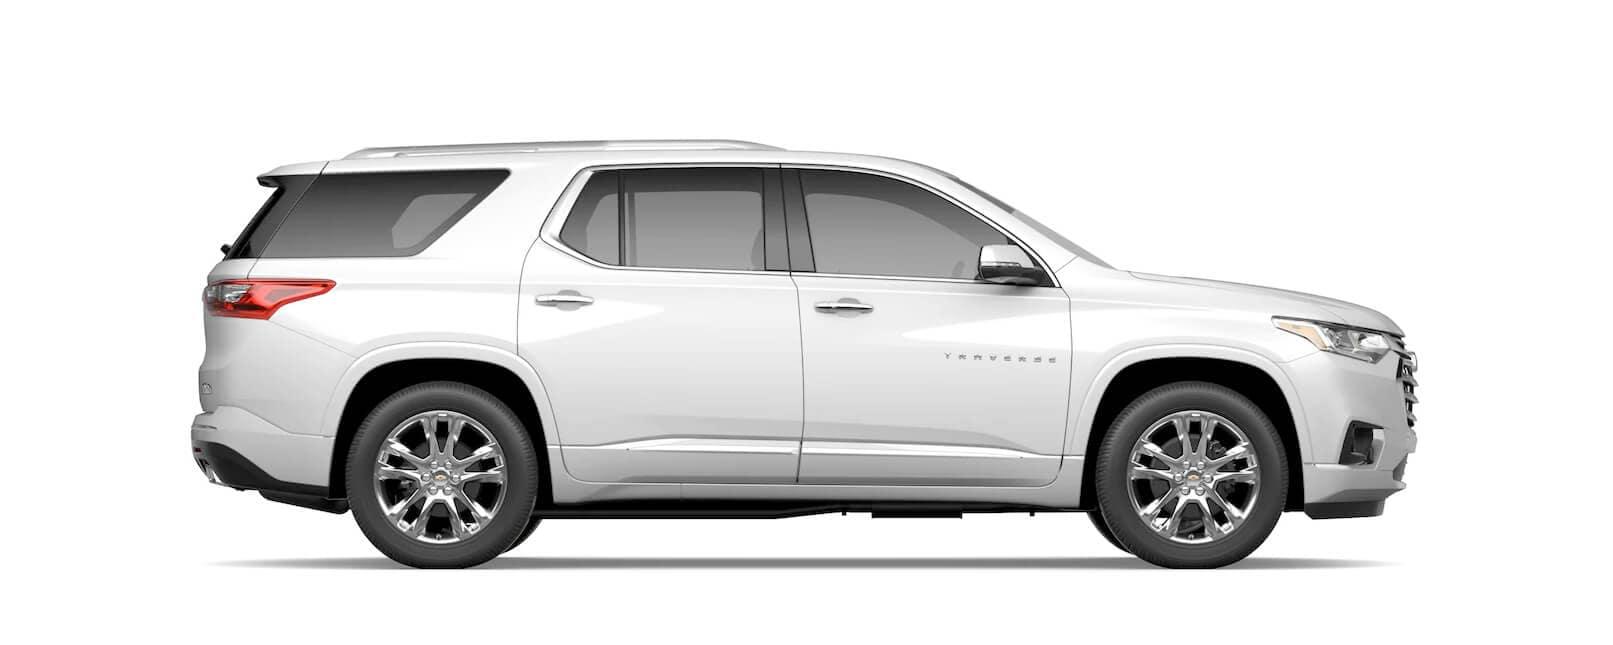 New Chevrolet Vehicles 2021 Traverse